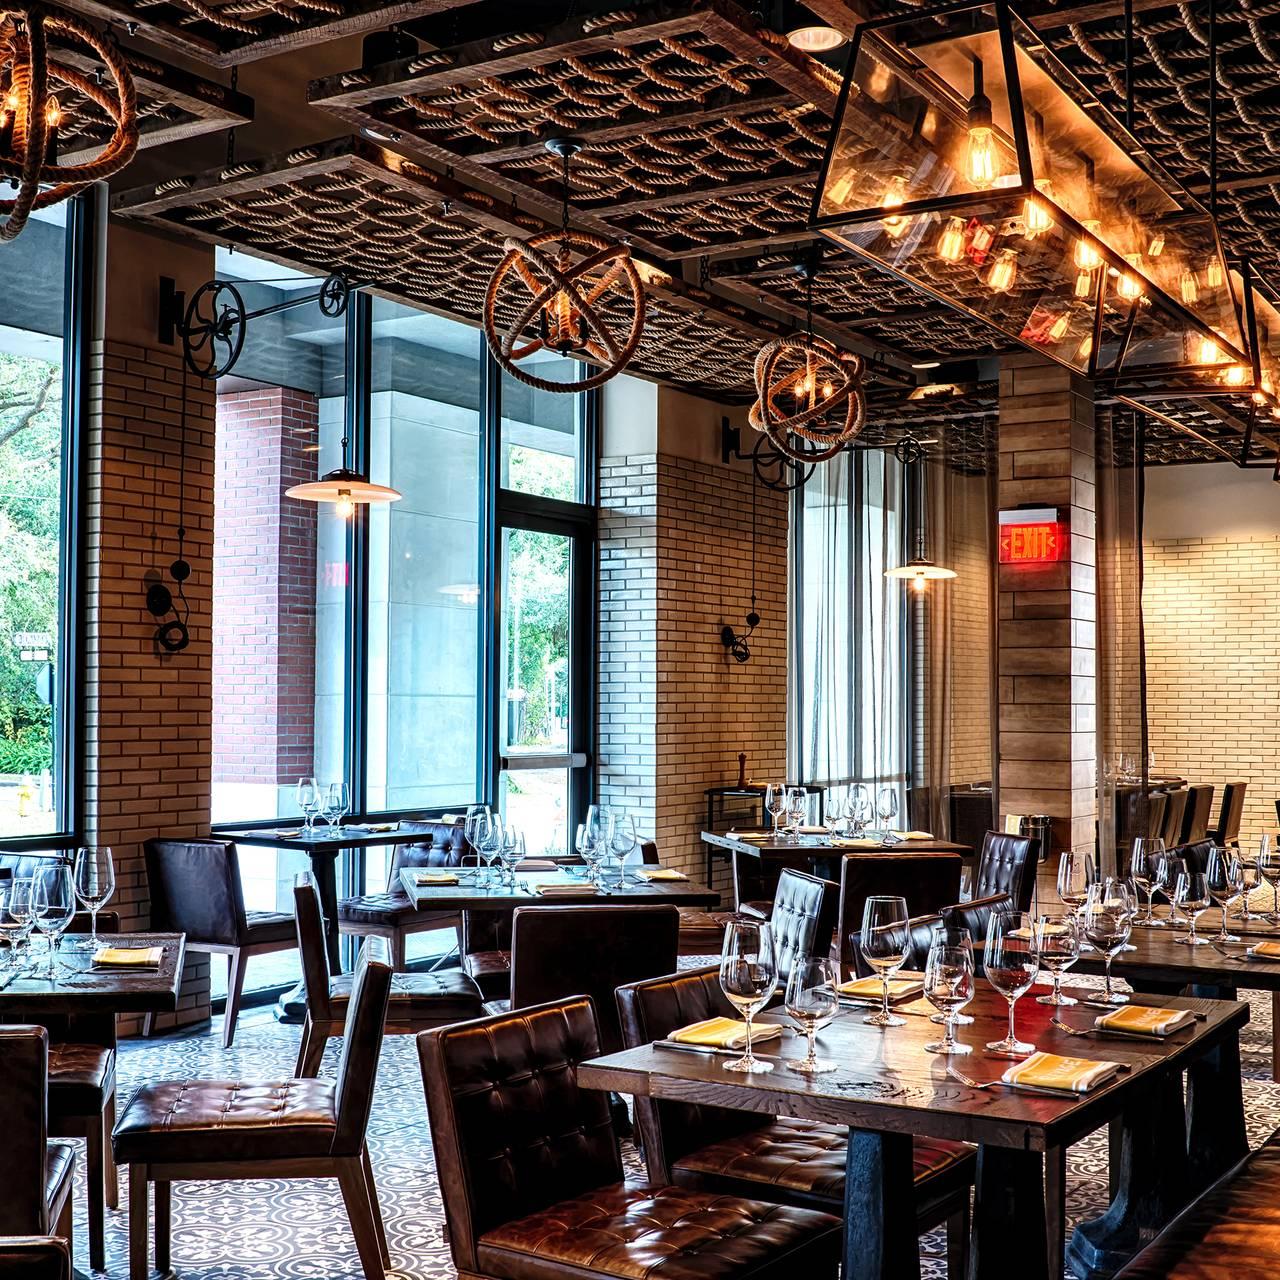 Élevage at Epicurean Hotel Restaurant - Tampa, FL | OpenTable